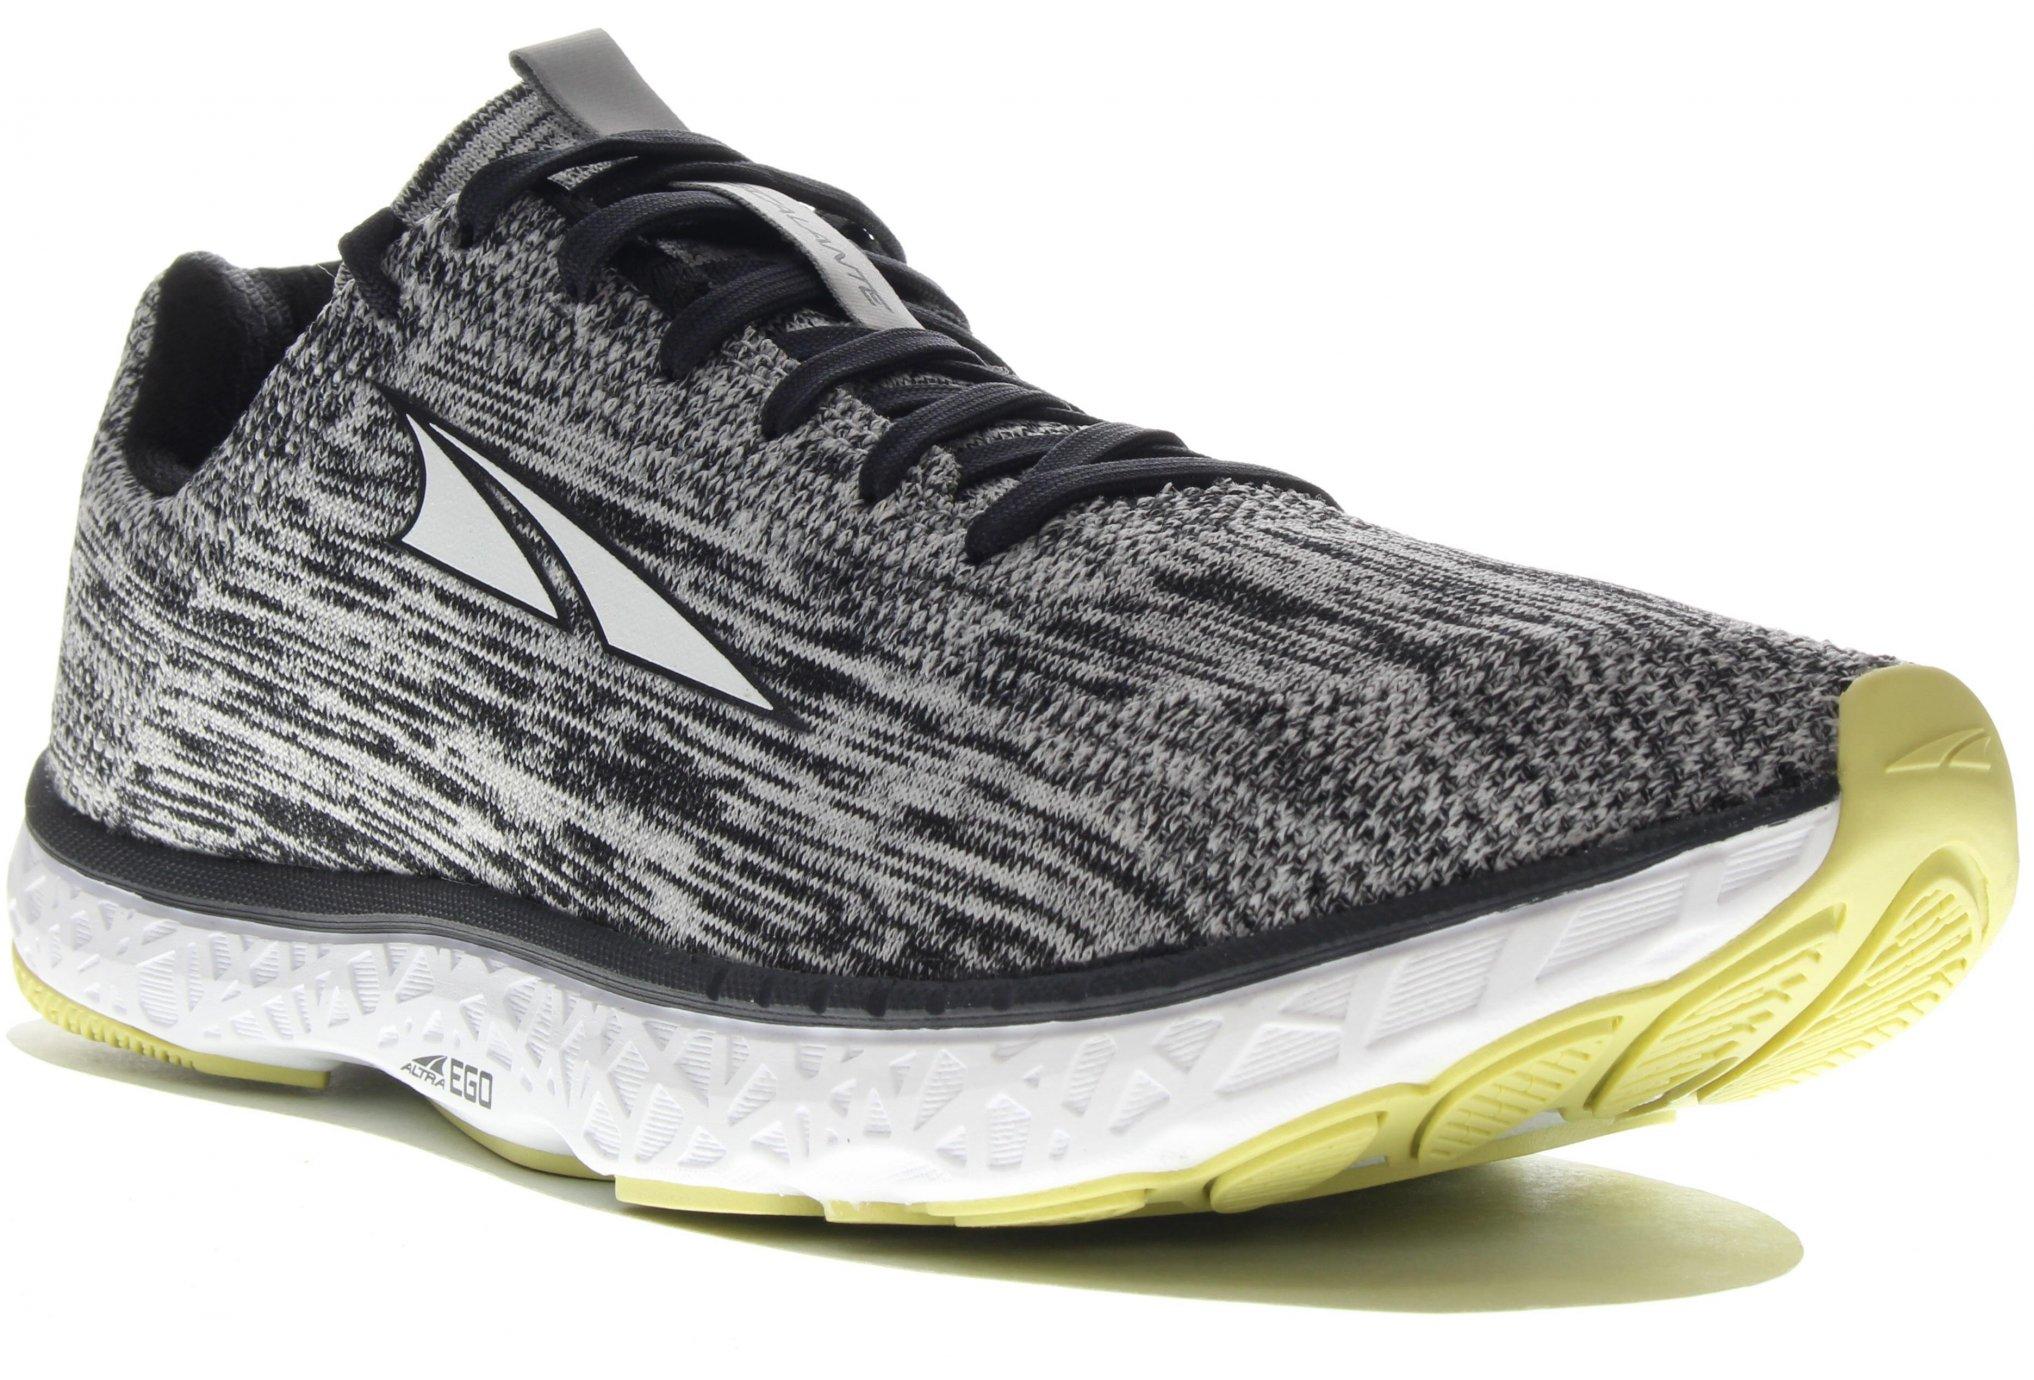 Altra Escalante 1.5 Chaussures running femme